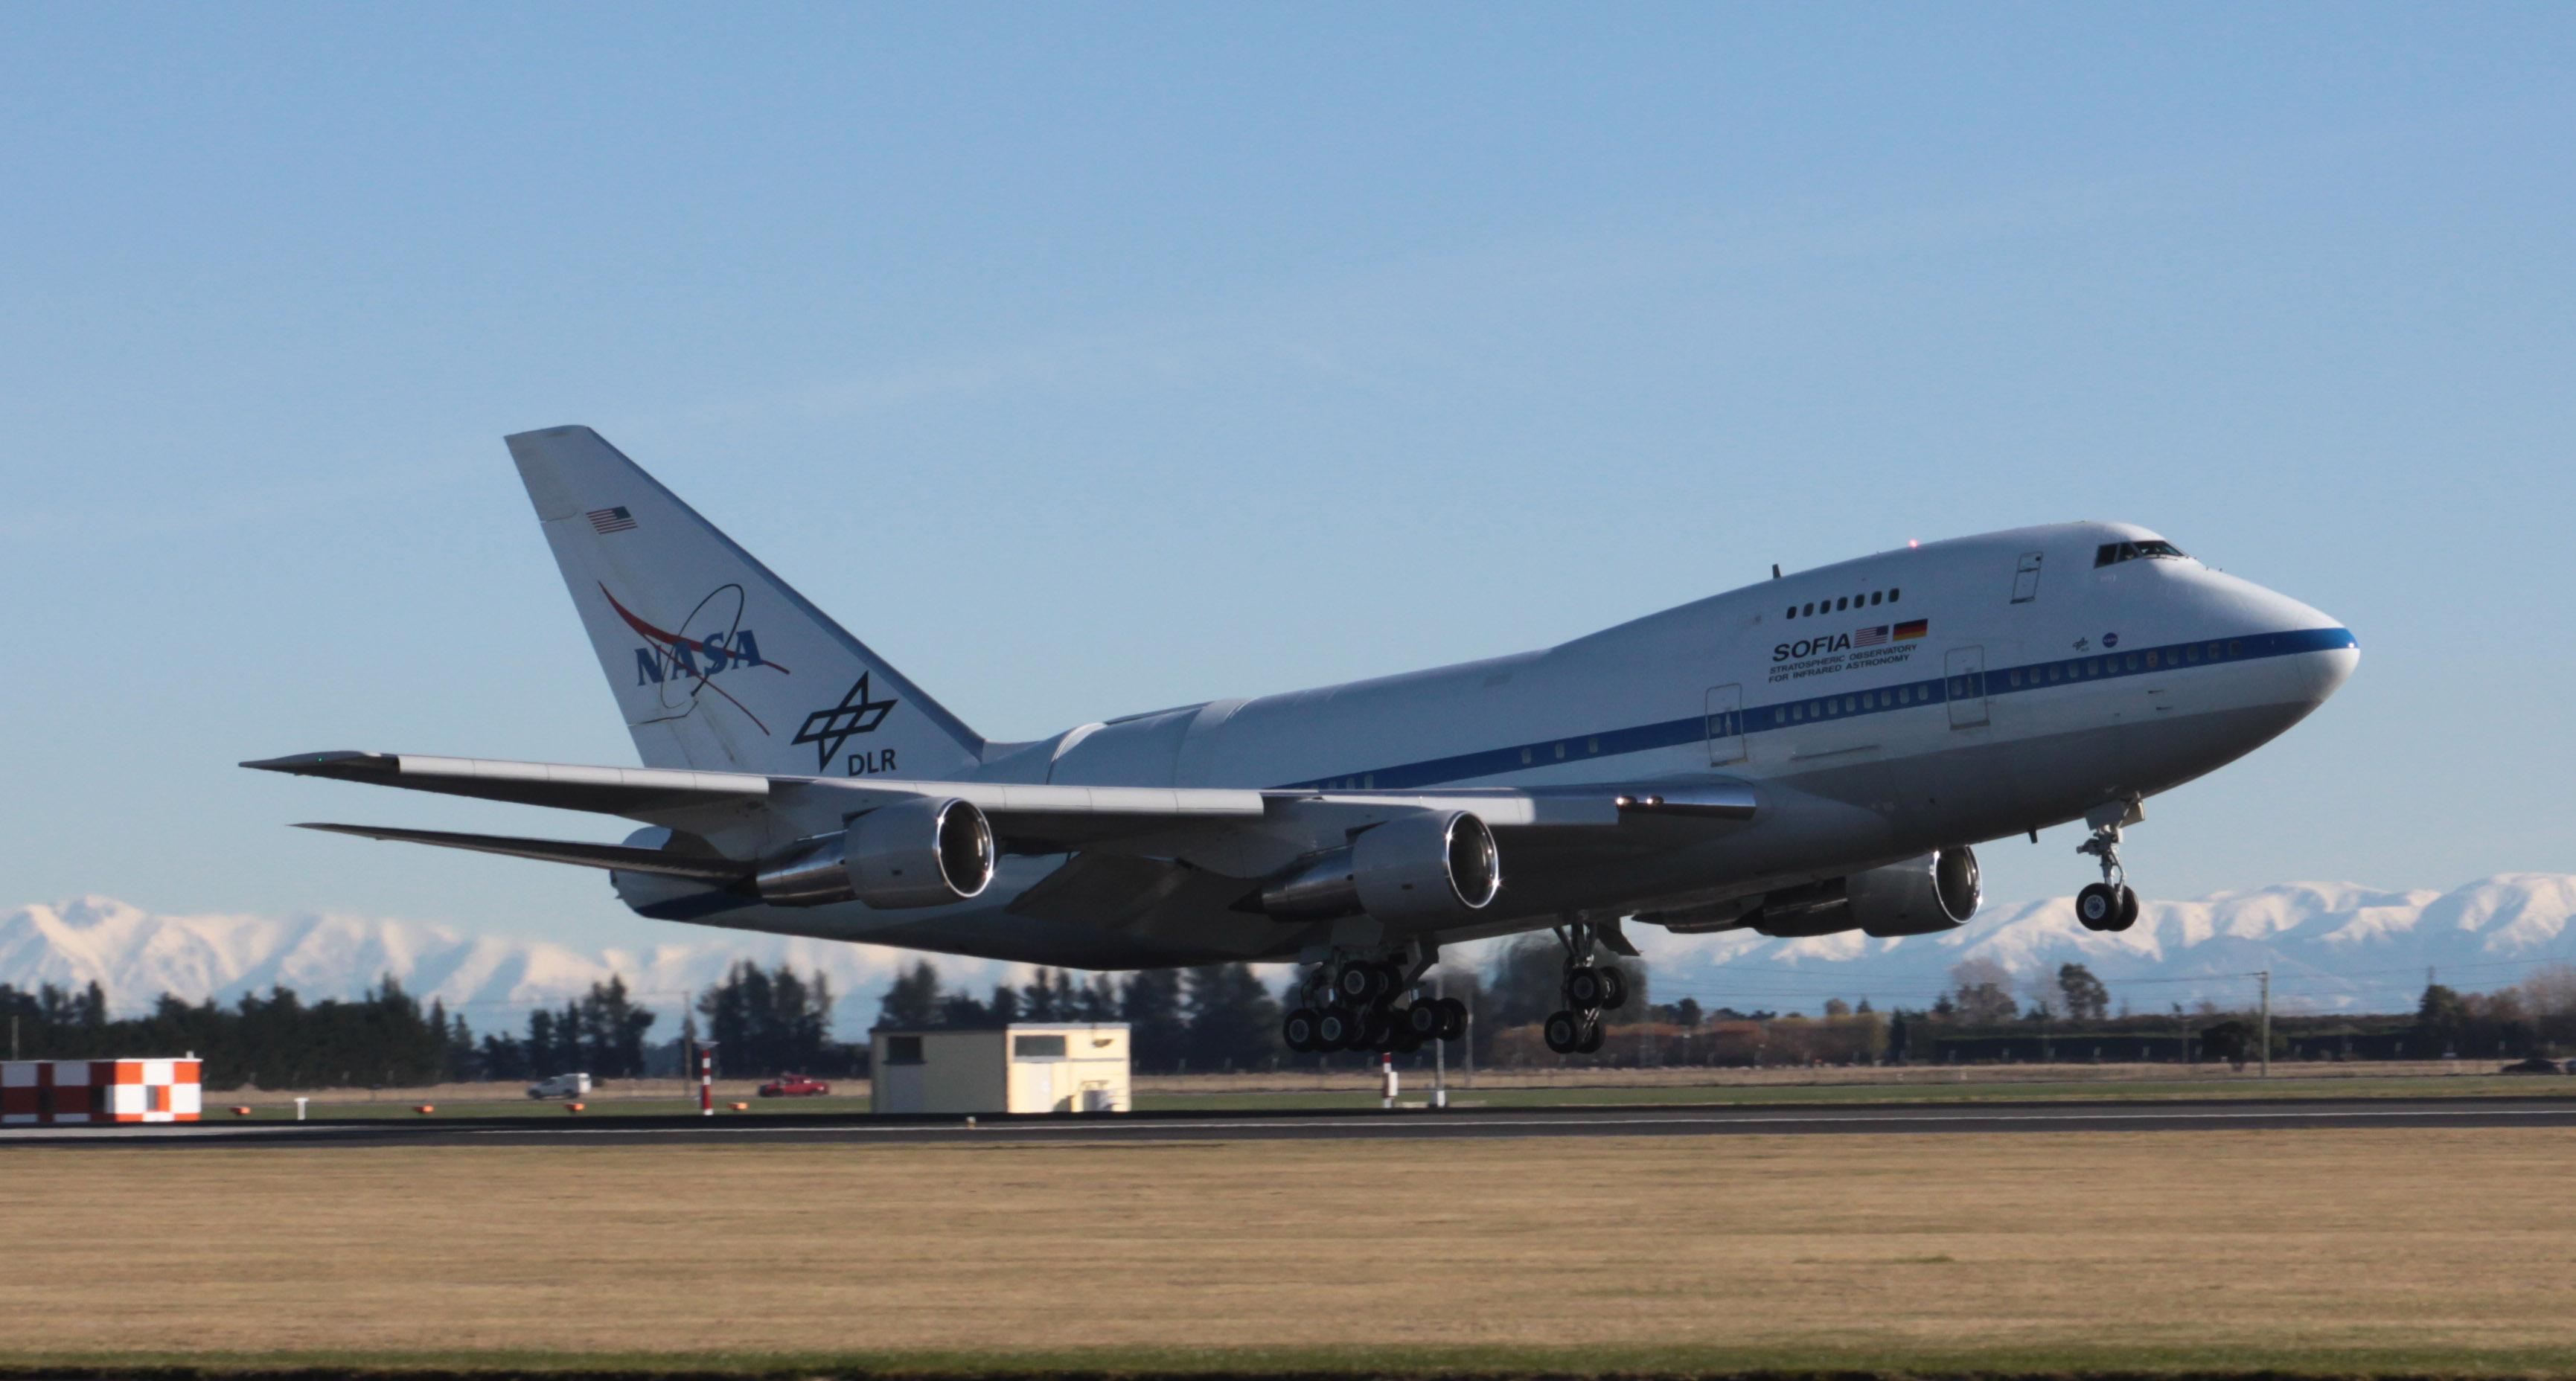 Sofia heads to new zealand to study southern skies nasa for Nasa air study